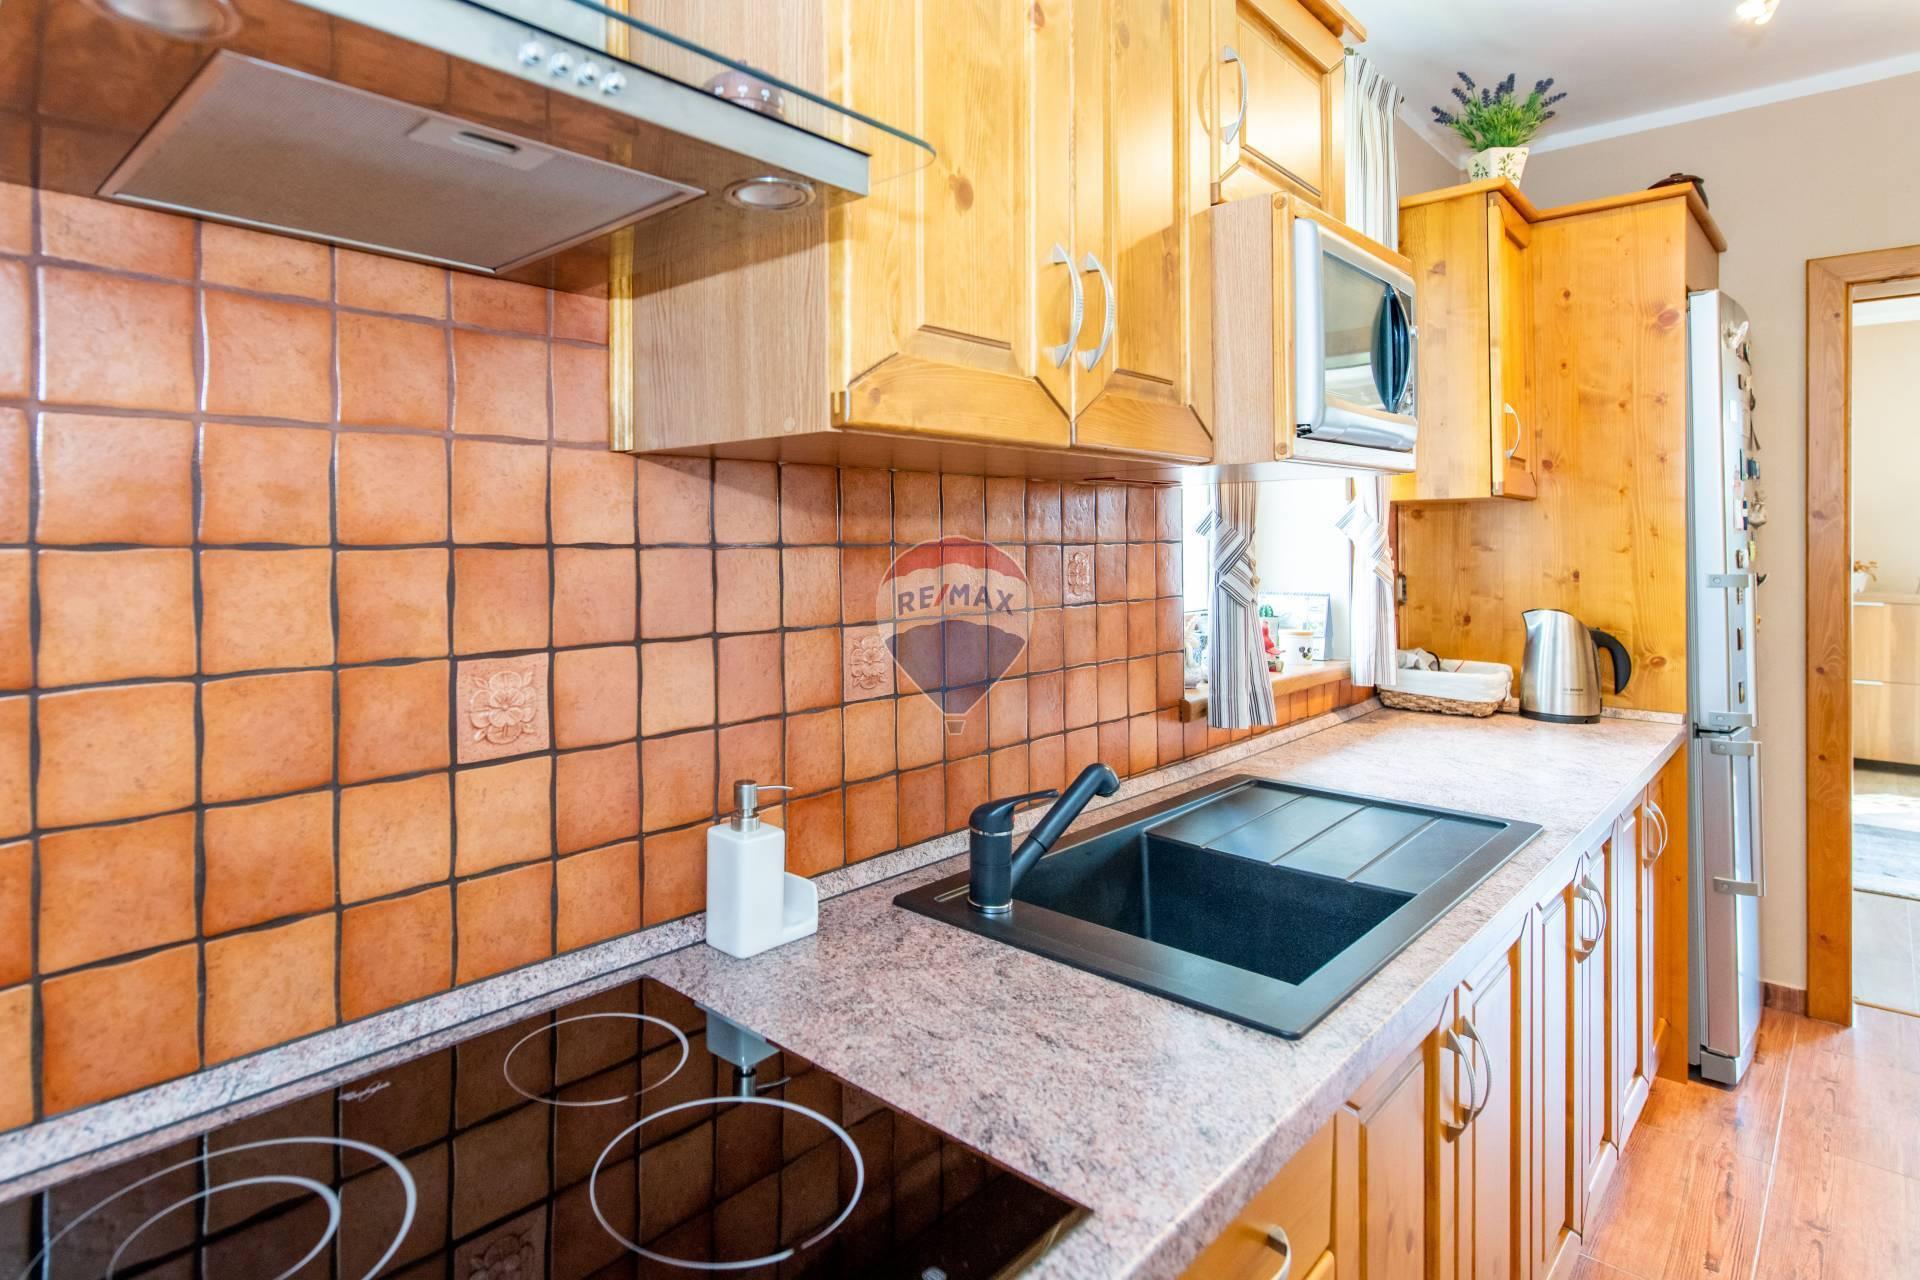 Predaj bytu (3 izbový) 88 m2, Vysoké Tatry - 3-izbový byt Vysoké Tatry